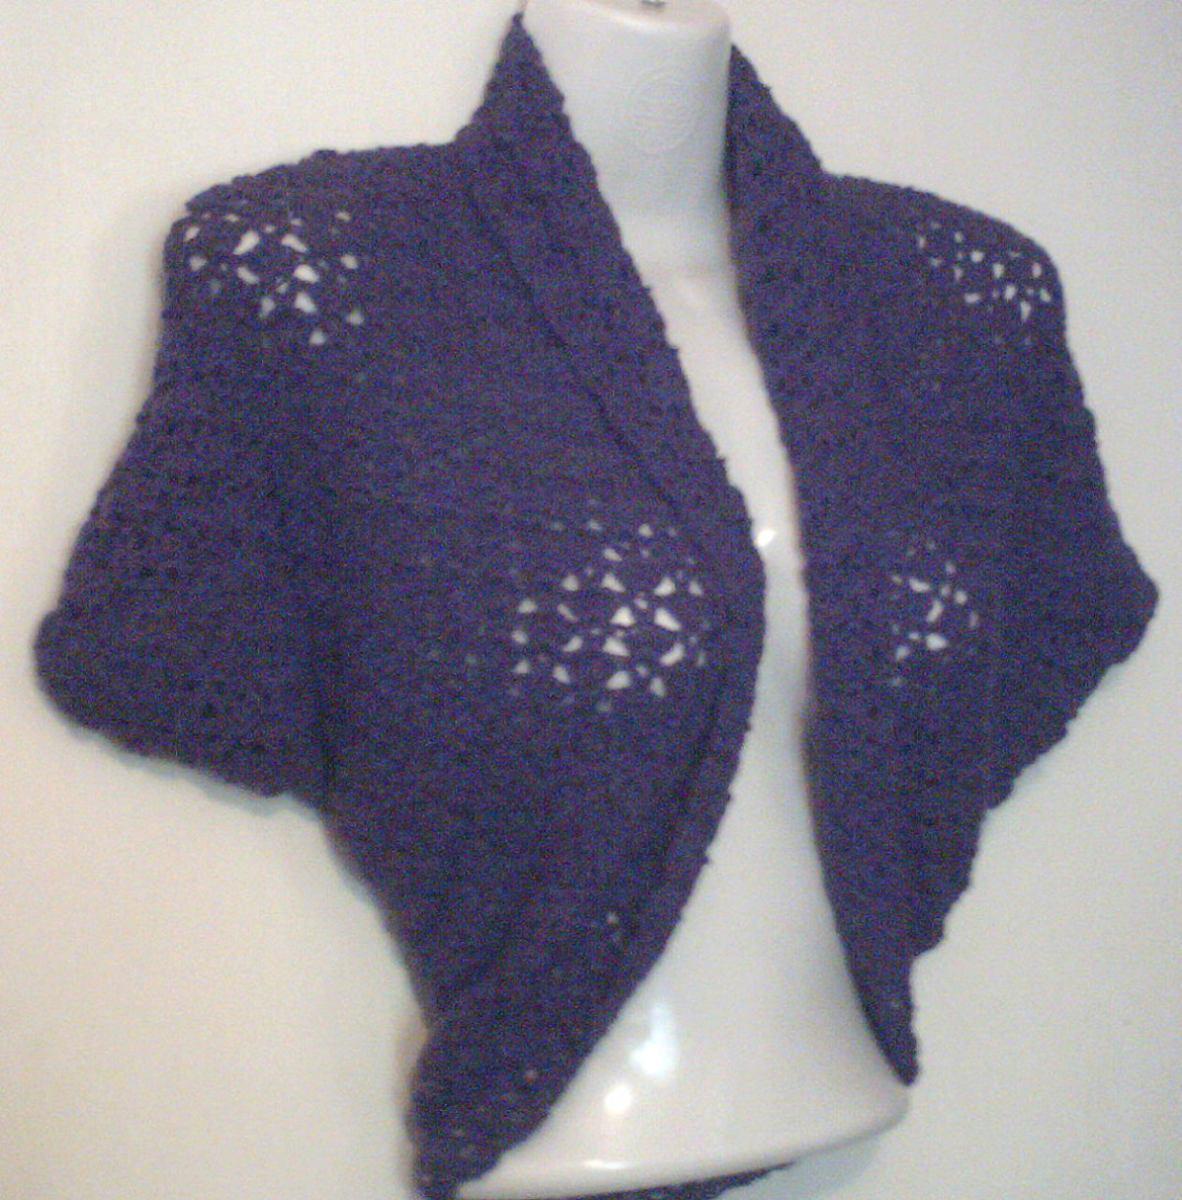 Tejidos con hilos carteras car curso de crochet - Manualidades con hilo ...